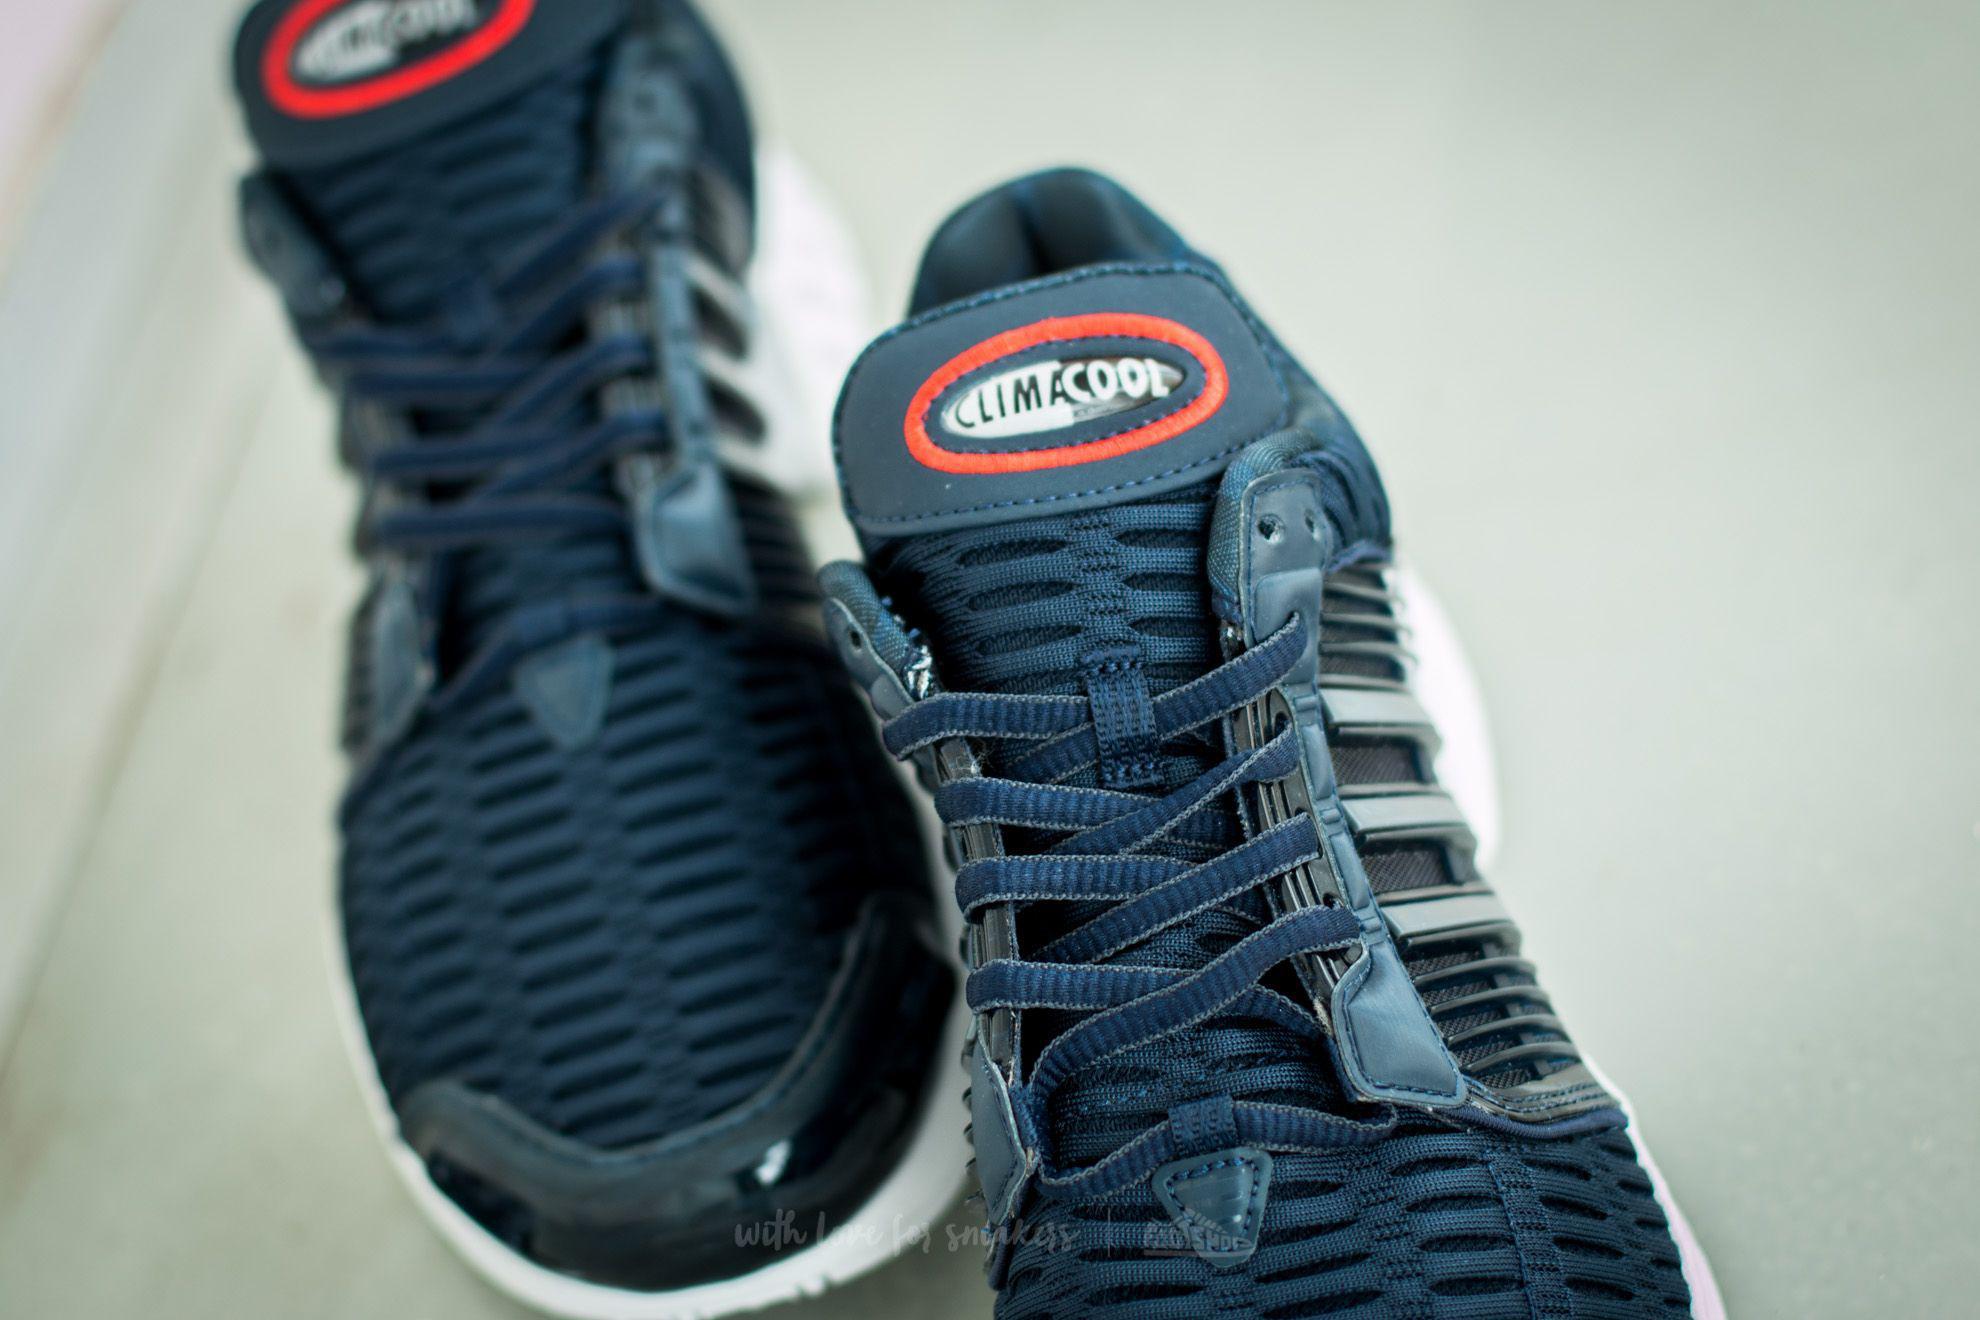 new arrival c6d05 914db Lyst - adidas Originals Adidas Climacool 1 Collegiate Navy  Utility ...